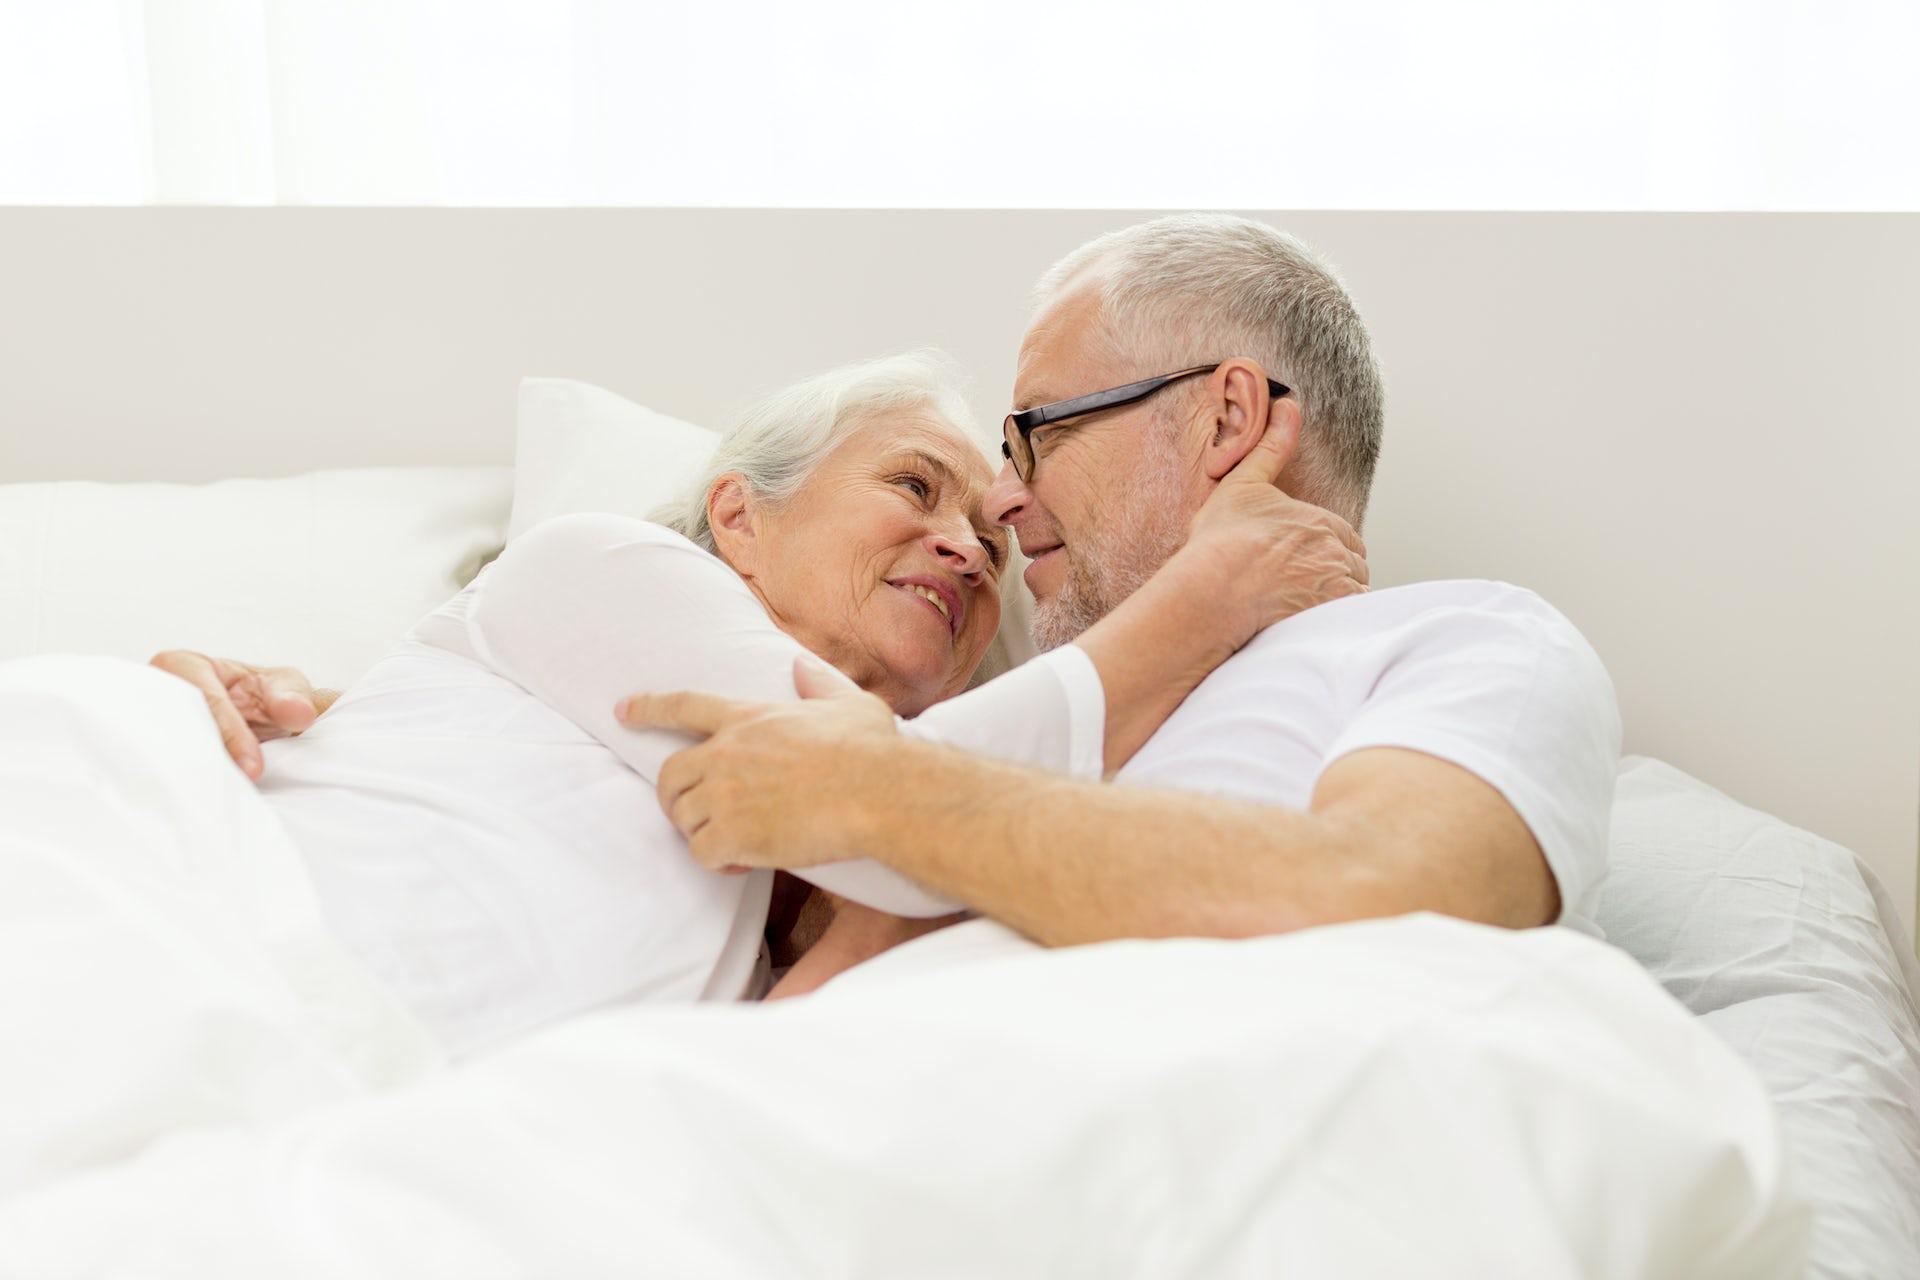 the secret sex lives of older people that can make us rethink our